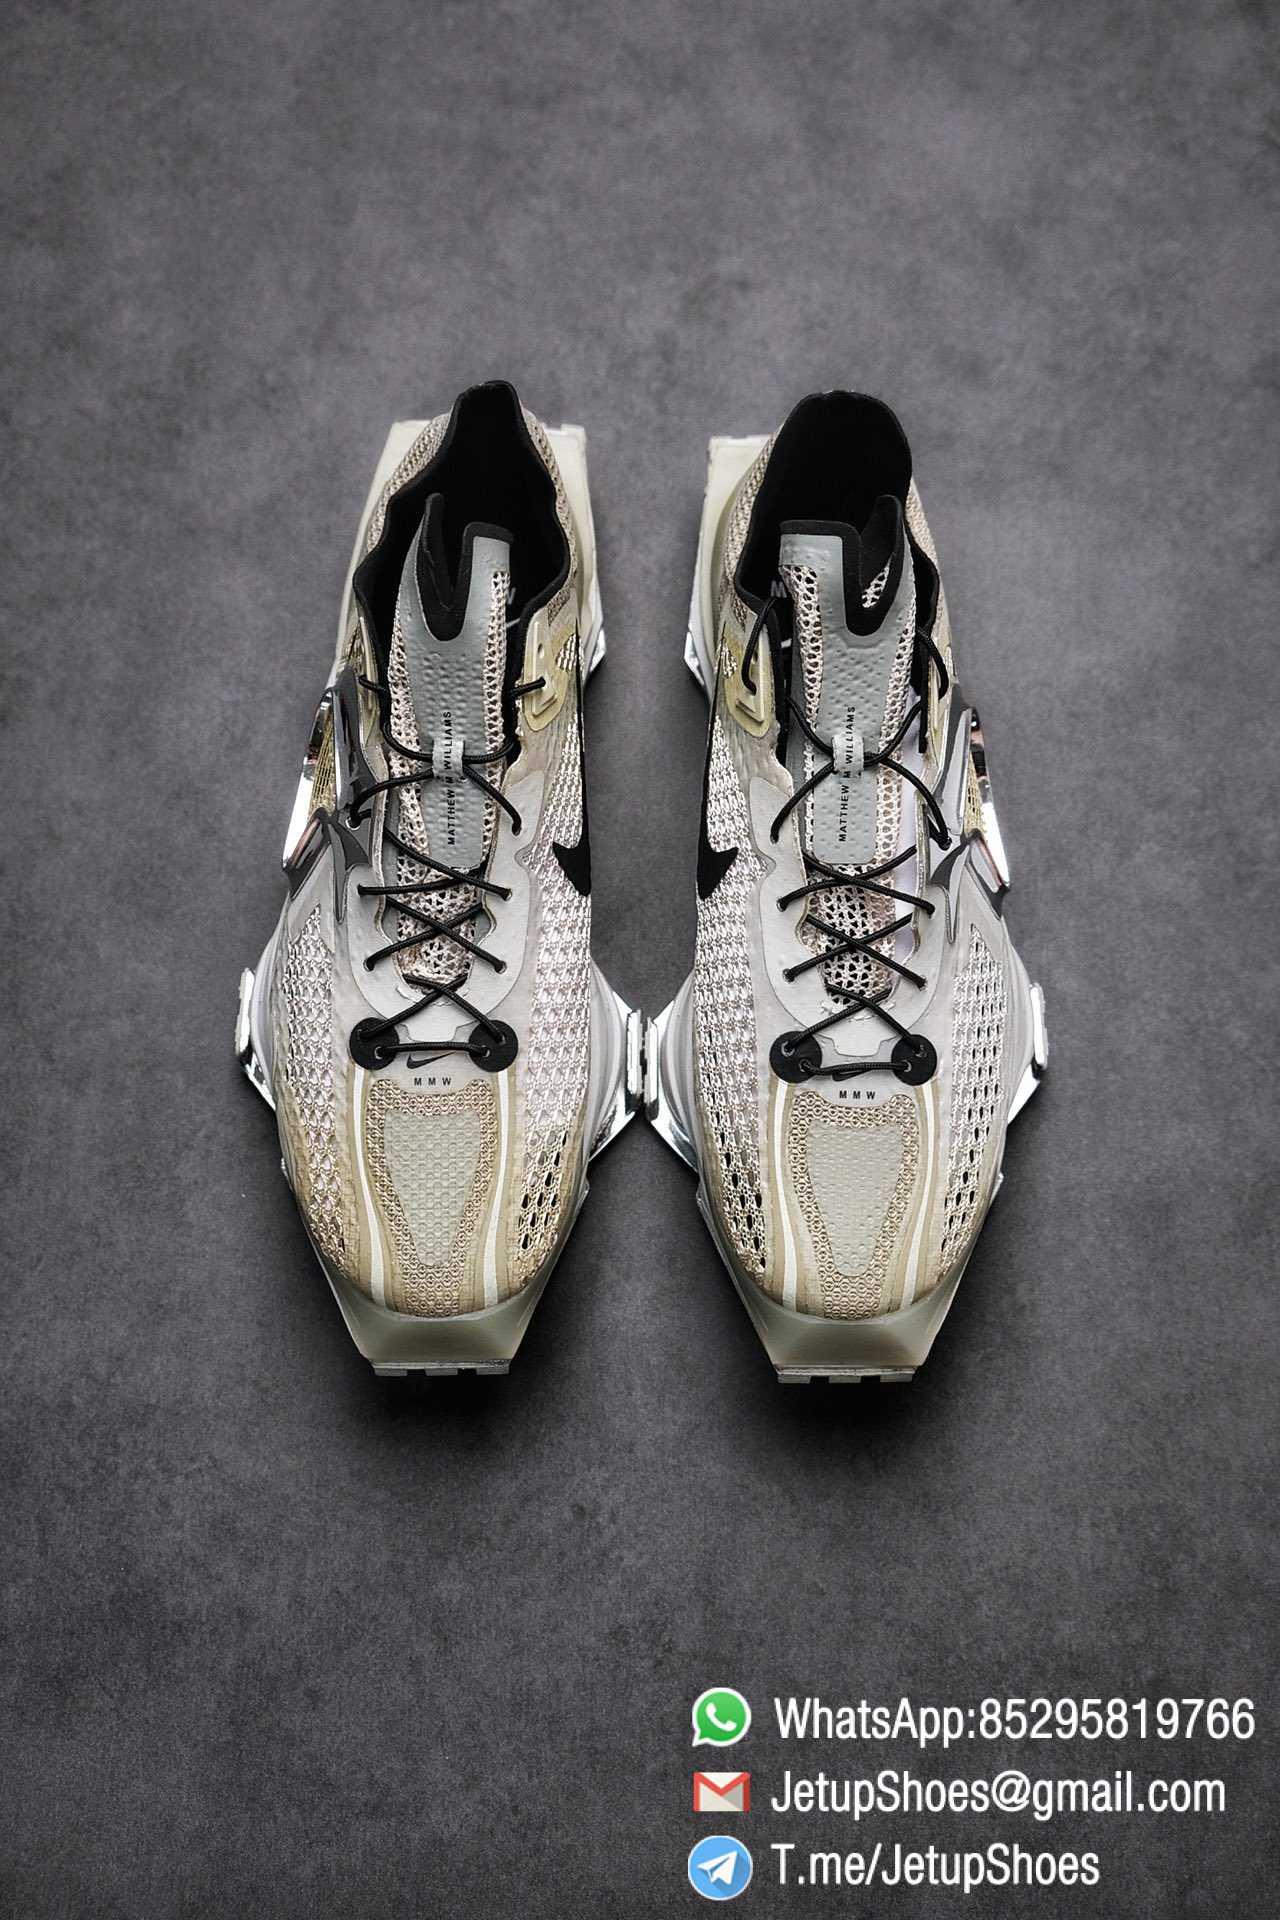 Best Replica Sneakers Matthew M Williams x Nike Zoom 004 Stone CU0676 200 Top Sneakers 018